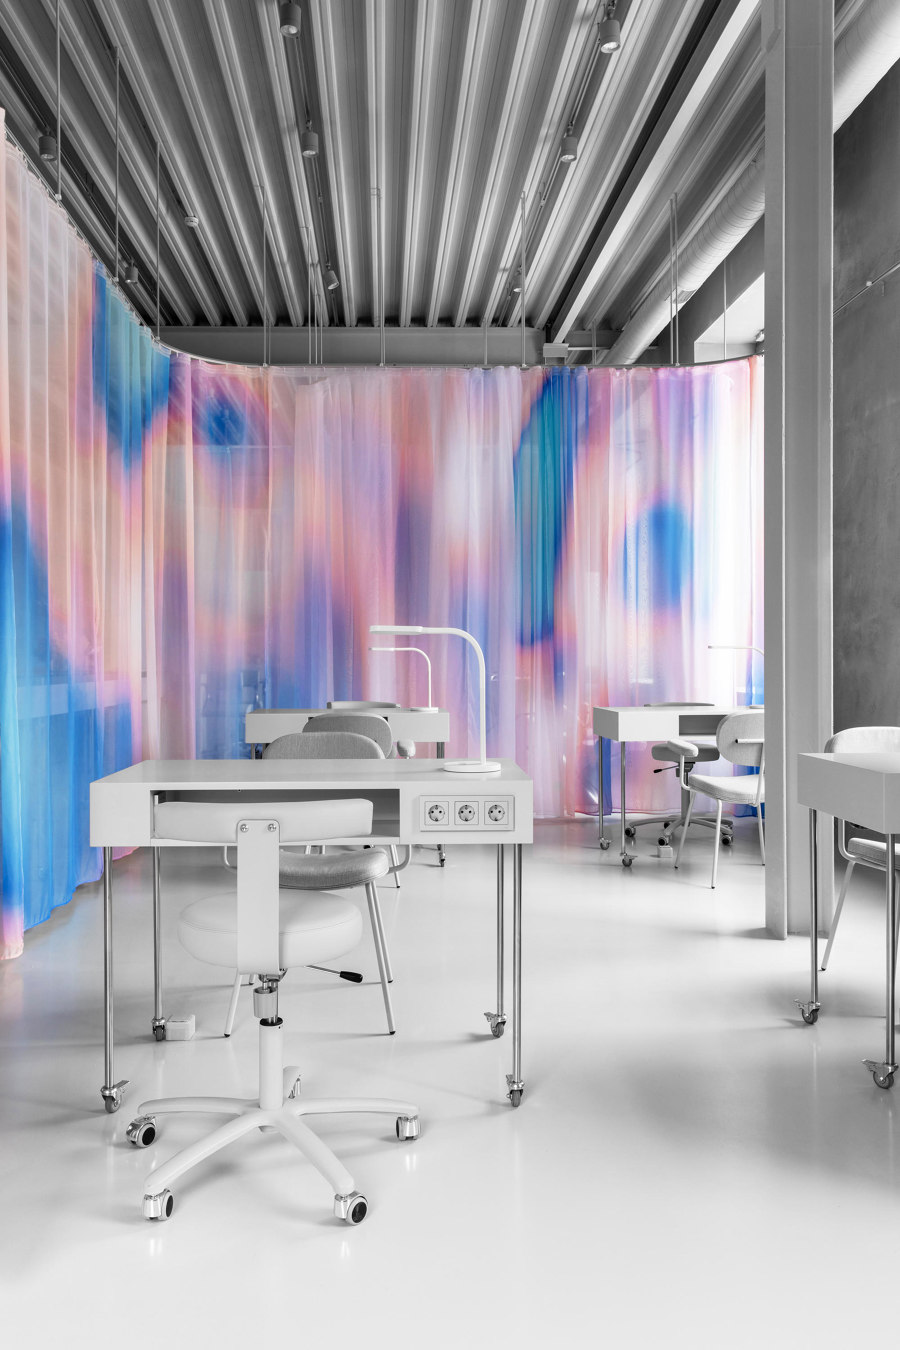 Flexible friends: Textiles in architecture | News